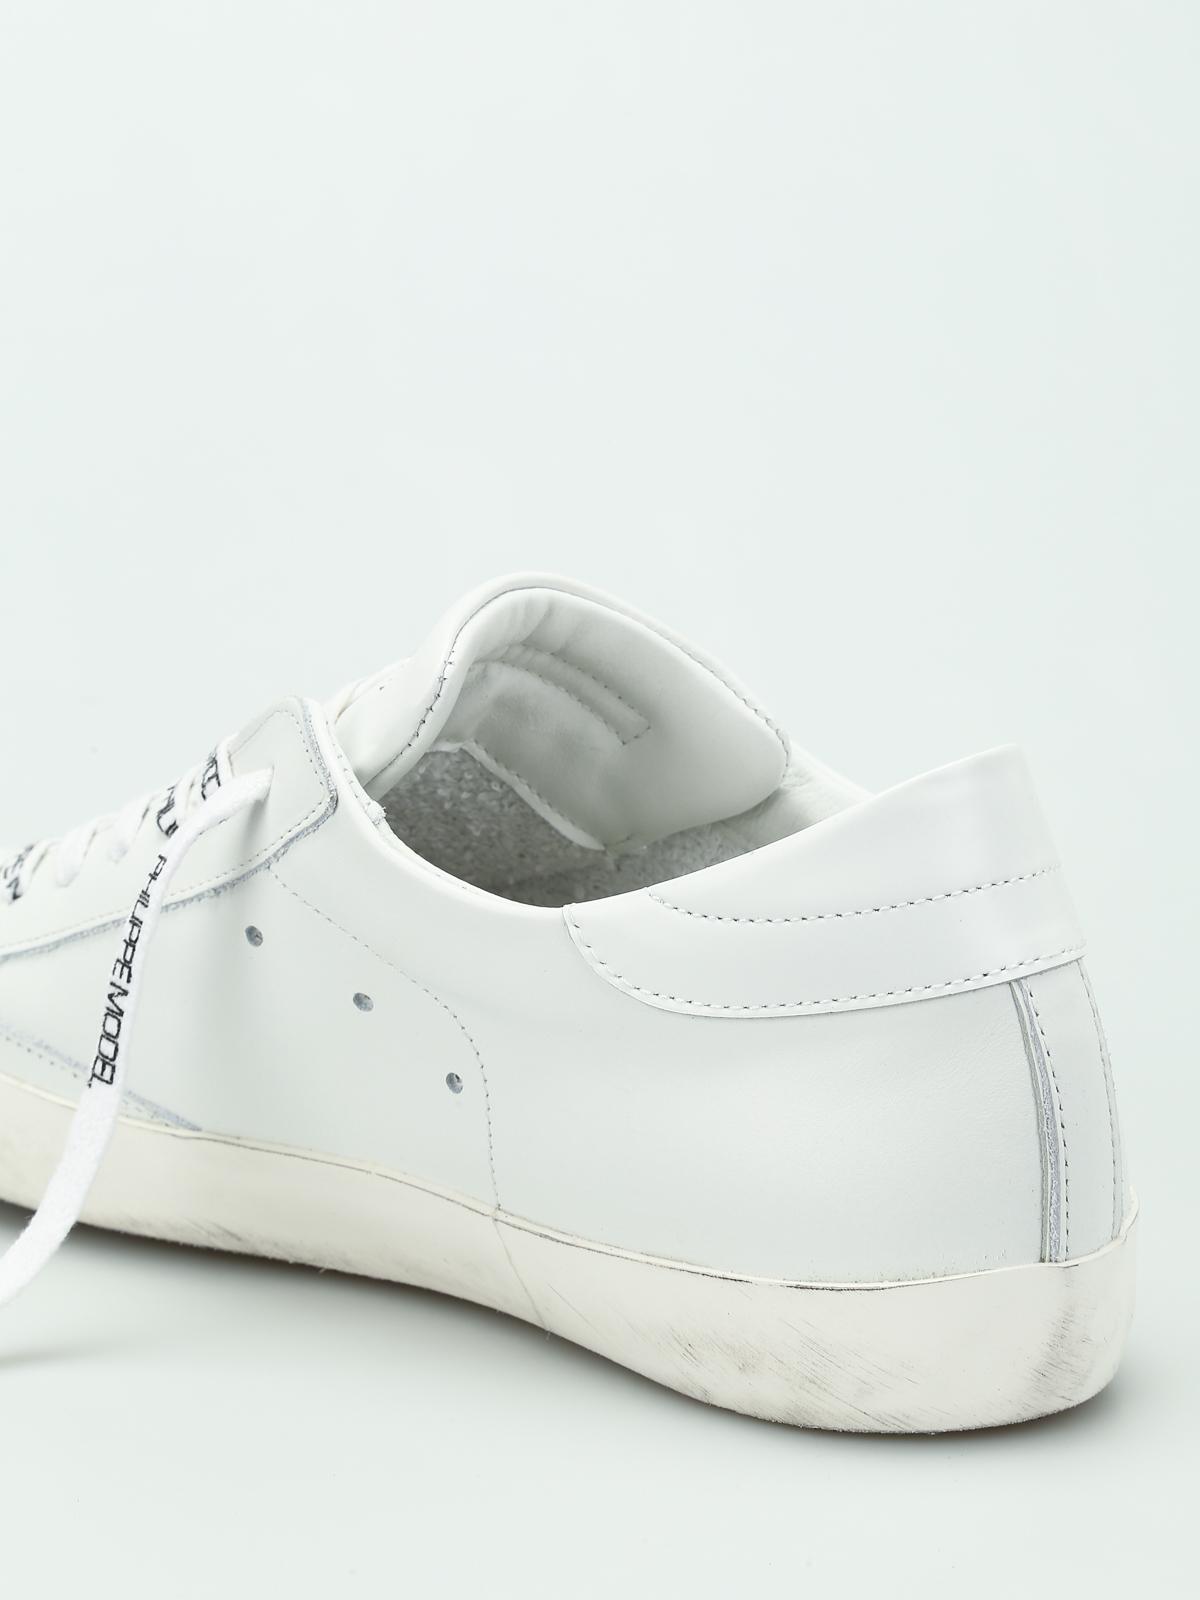 Paris Philippe Model Cllu Sneakers 1001 Laces Logo Trainers RqznBwP5